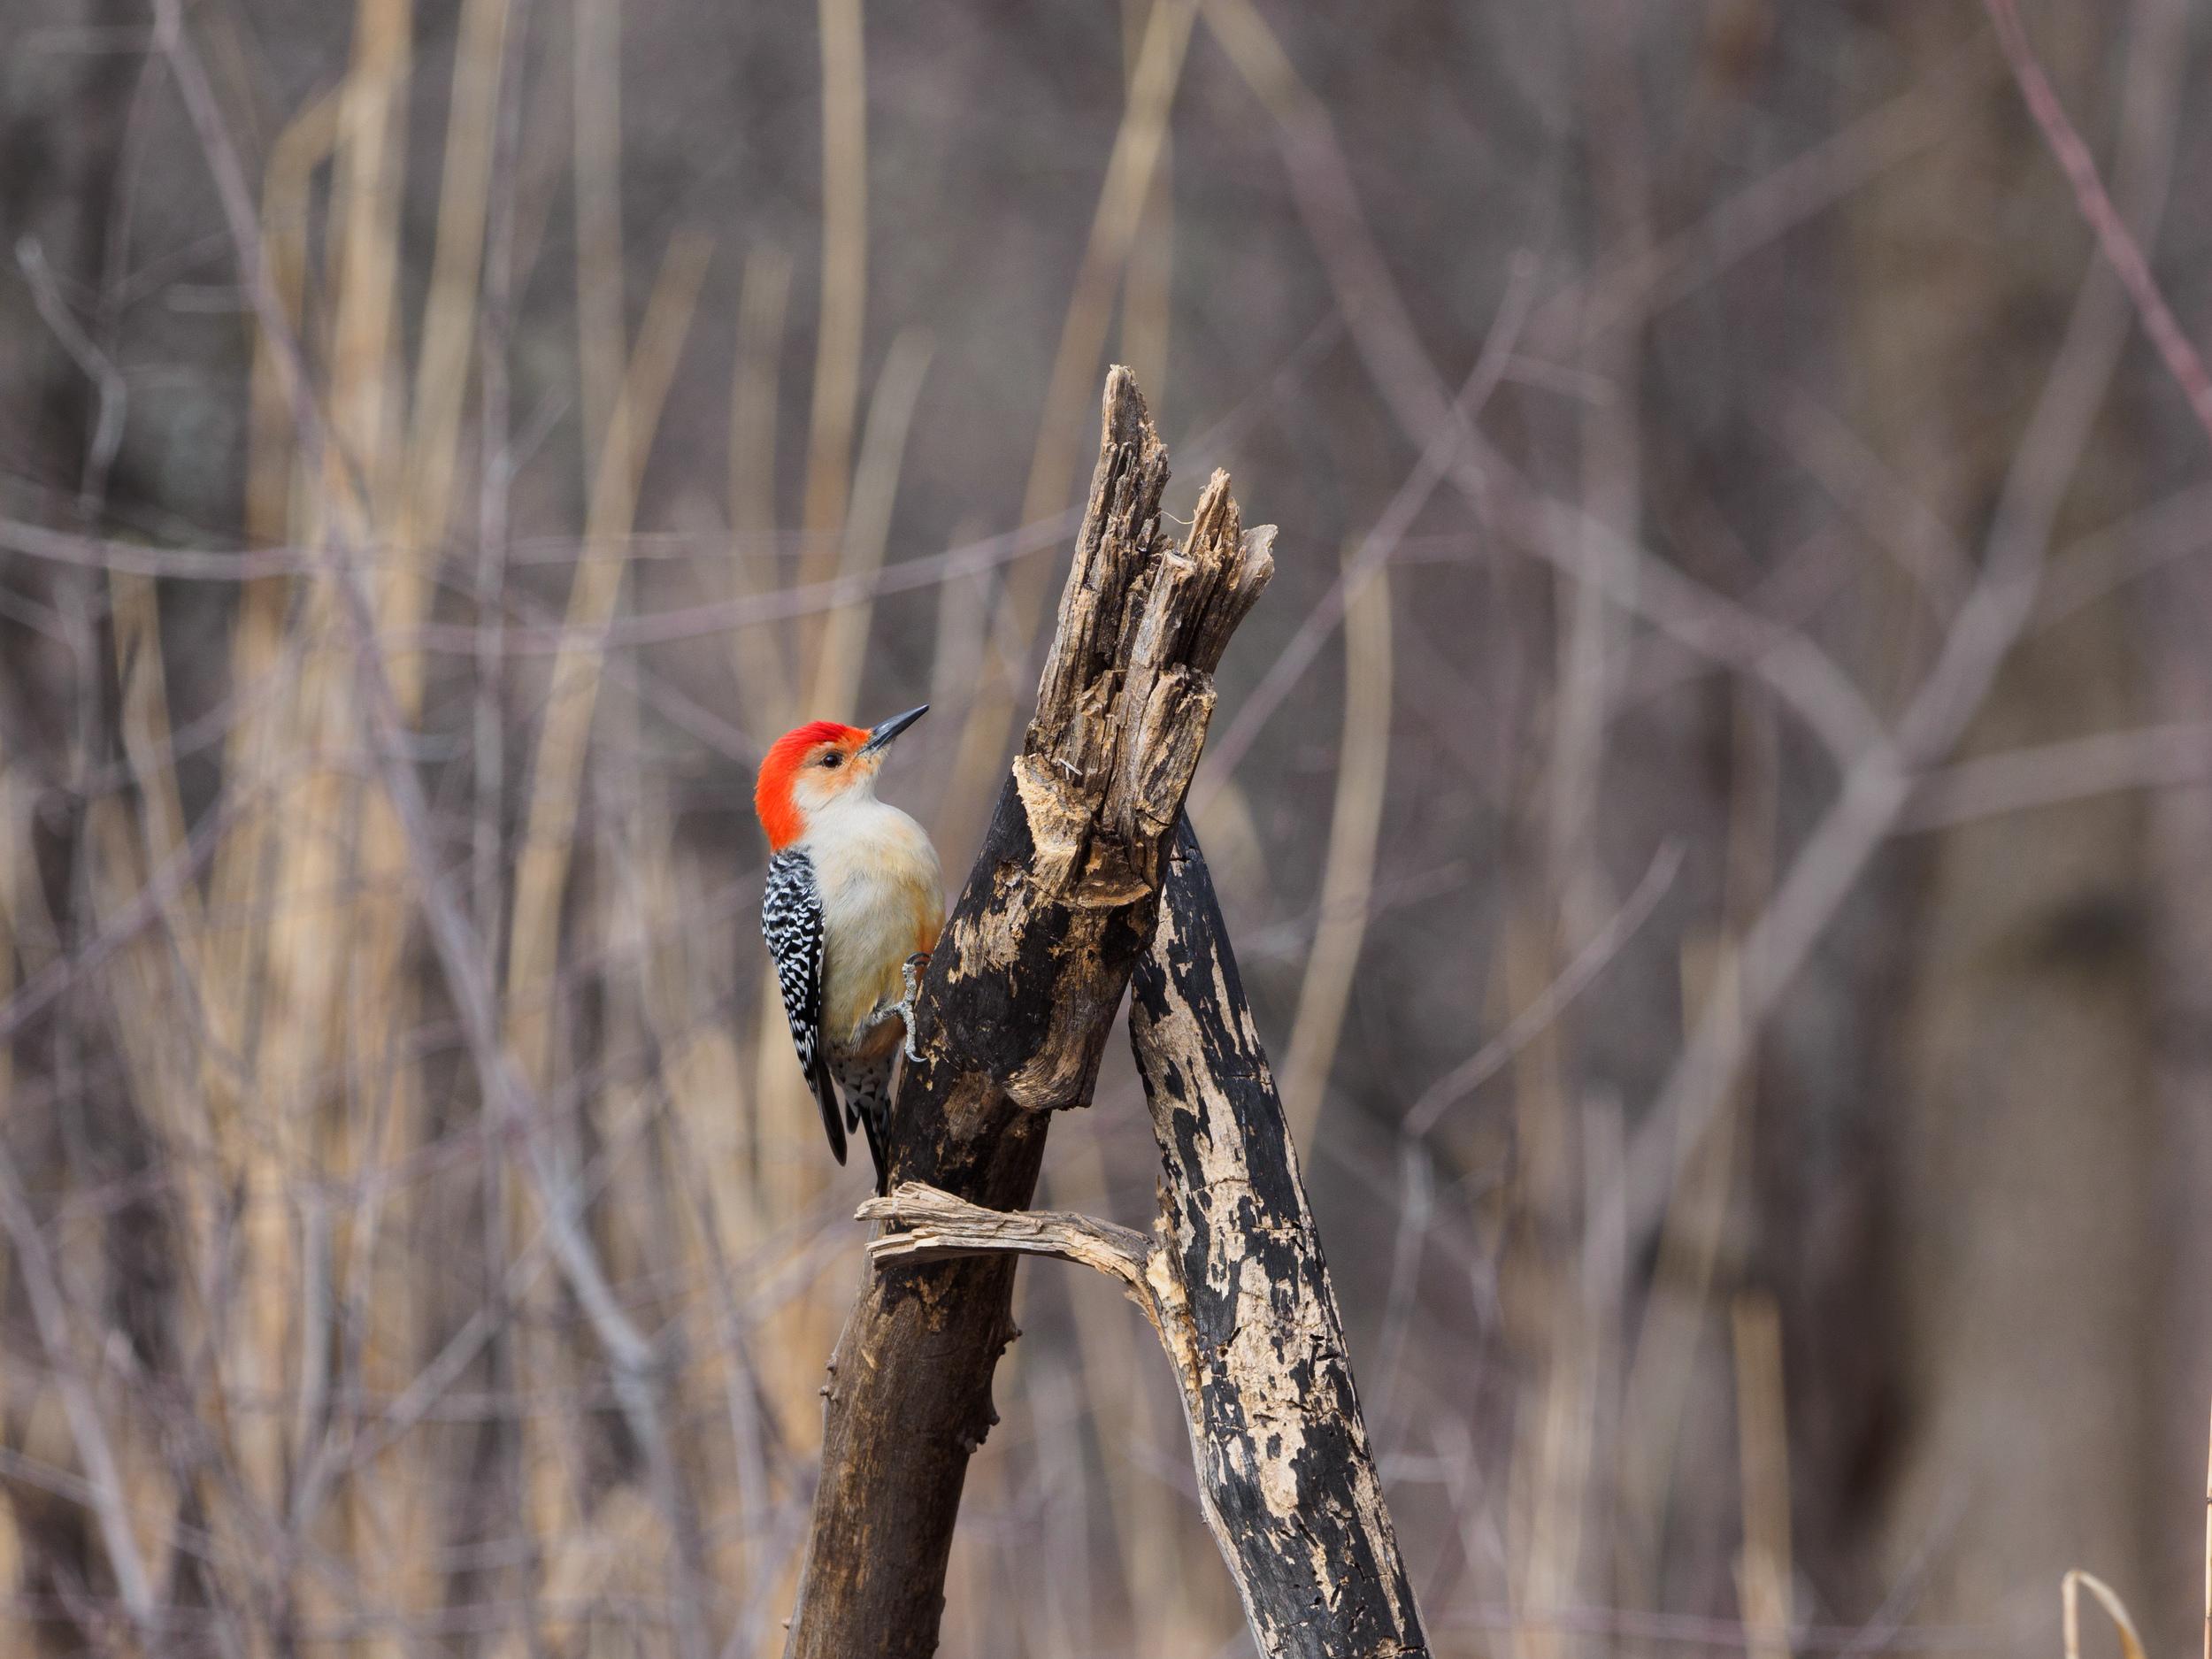 Red Bellied Woodpecker Oakland County Michigan E-M1 + mZuiko 300mm f/4 PRO + MC-14 Teleconverter.